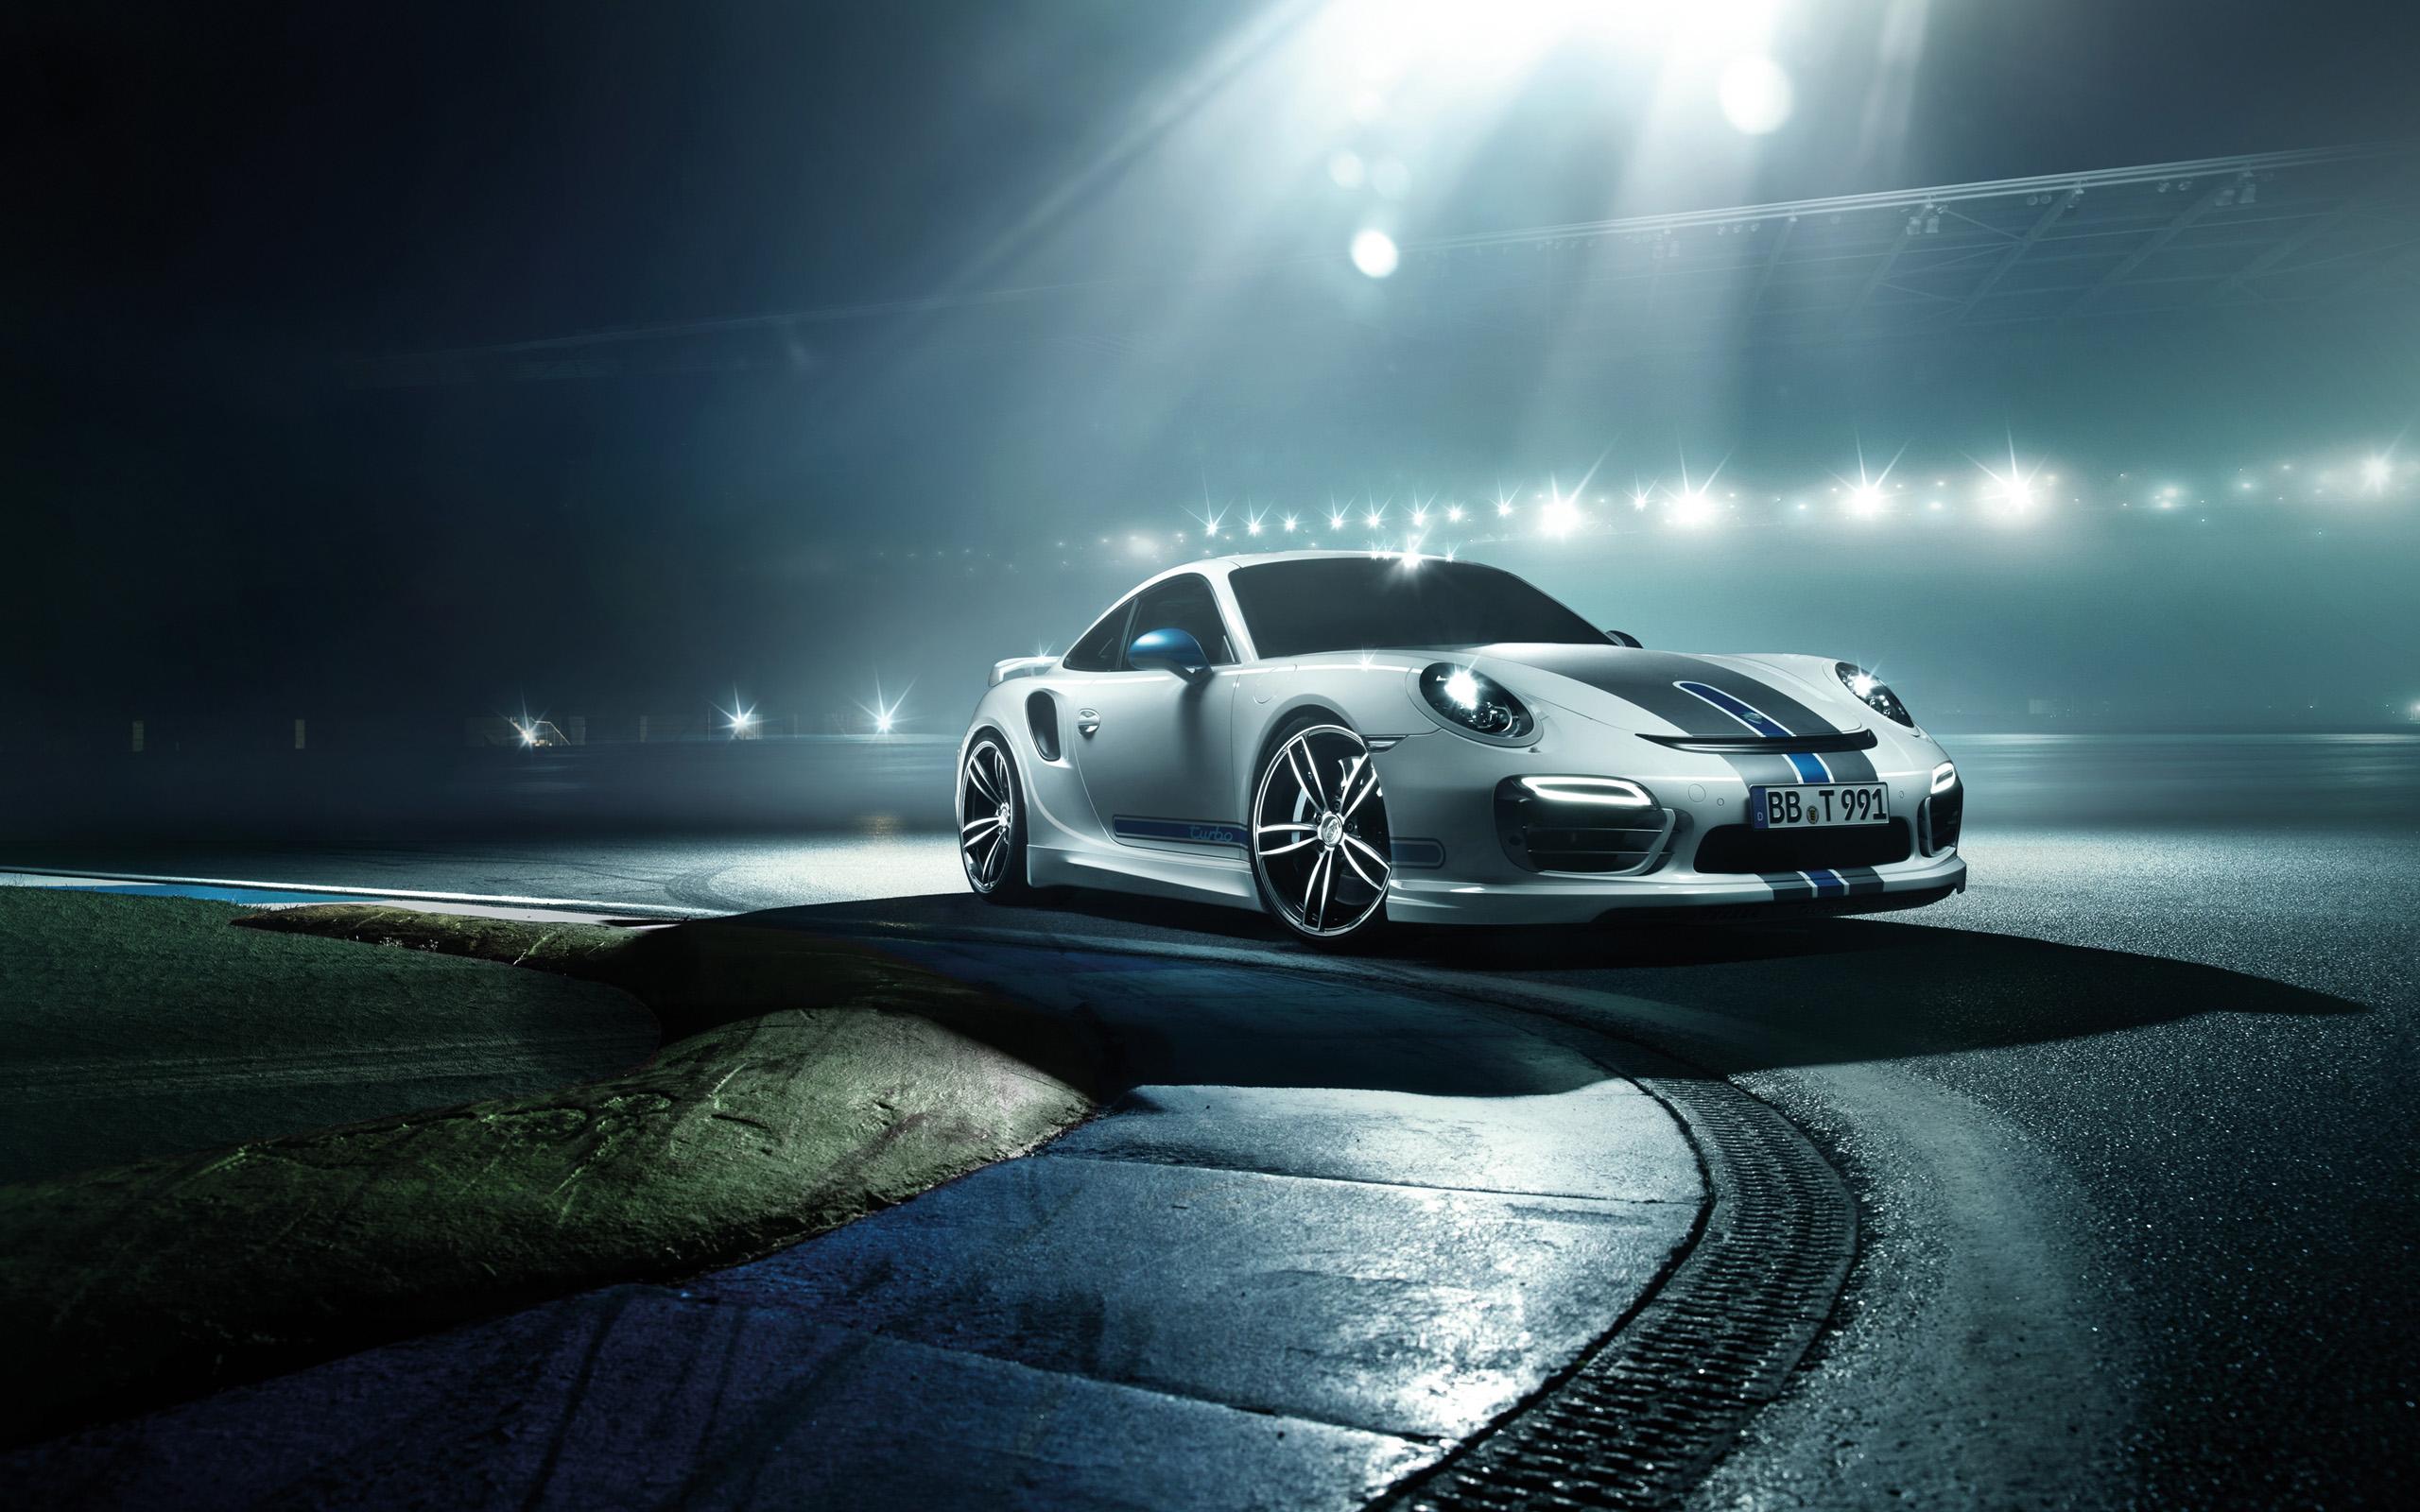 2014 Porsche 911 Turbo By TechArt Wallpapers HD Wallpapers 2560x1600